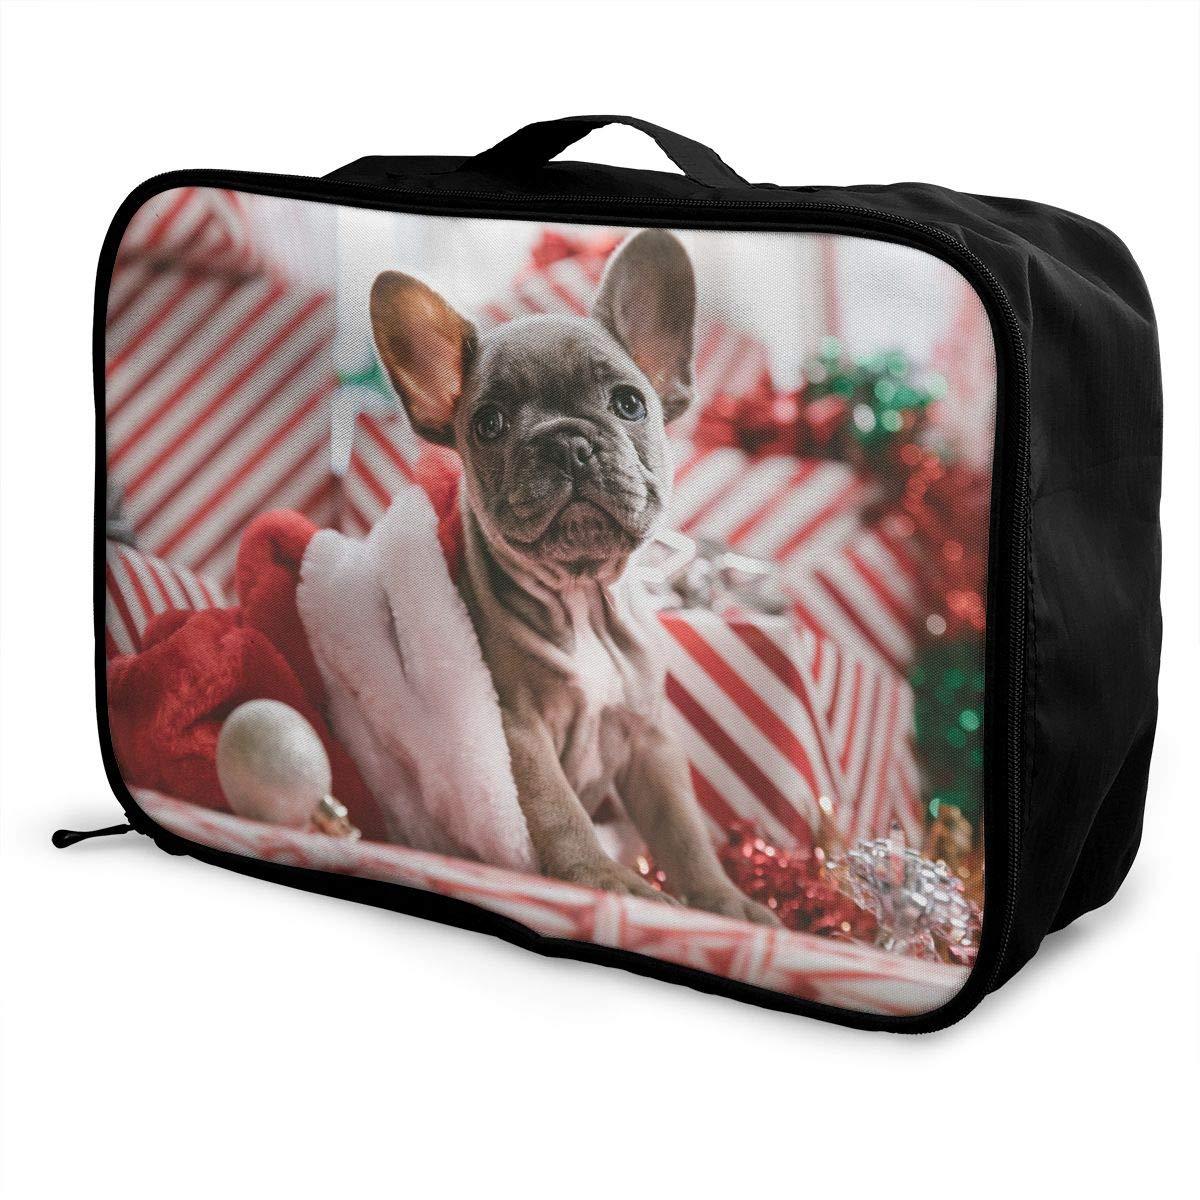 ADGAI Christmas Dog Canvas Travel Weekender Bag,Fashion Custom Lightweight Large Capacity Portable Luggage Bag,Suitcase Trolley Bag